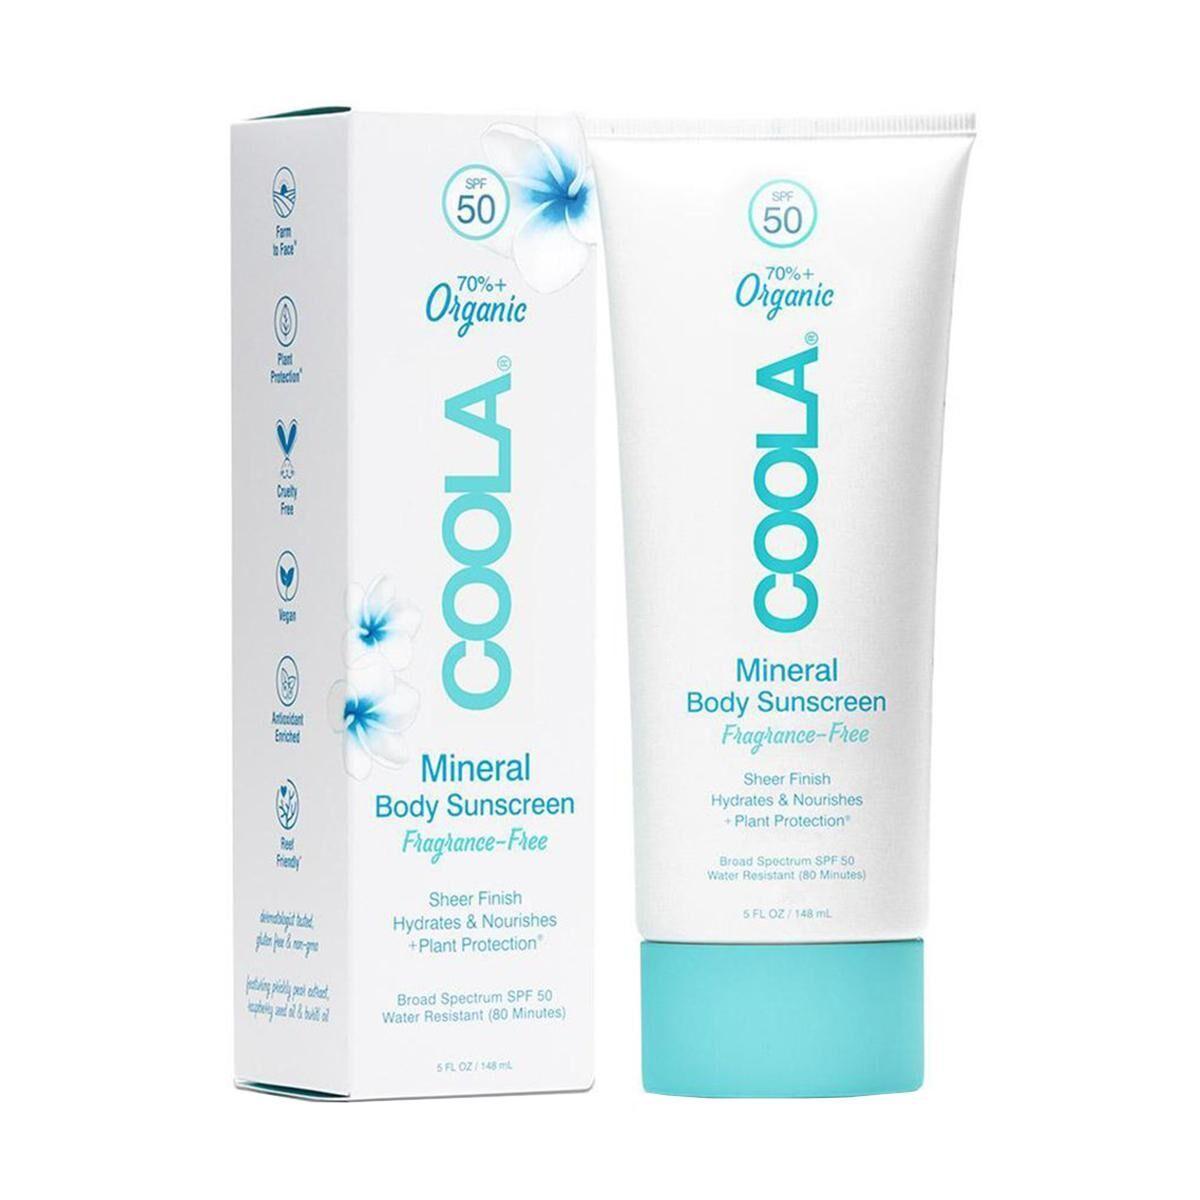 COOLA Suncare - SPF 50 Mineral Body Sunscreen